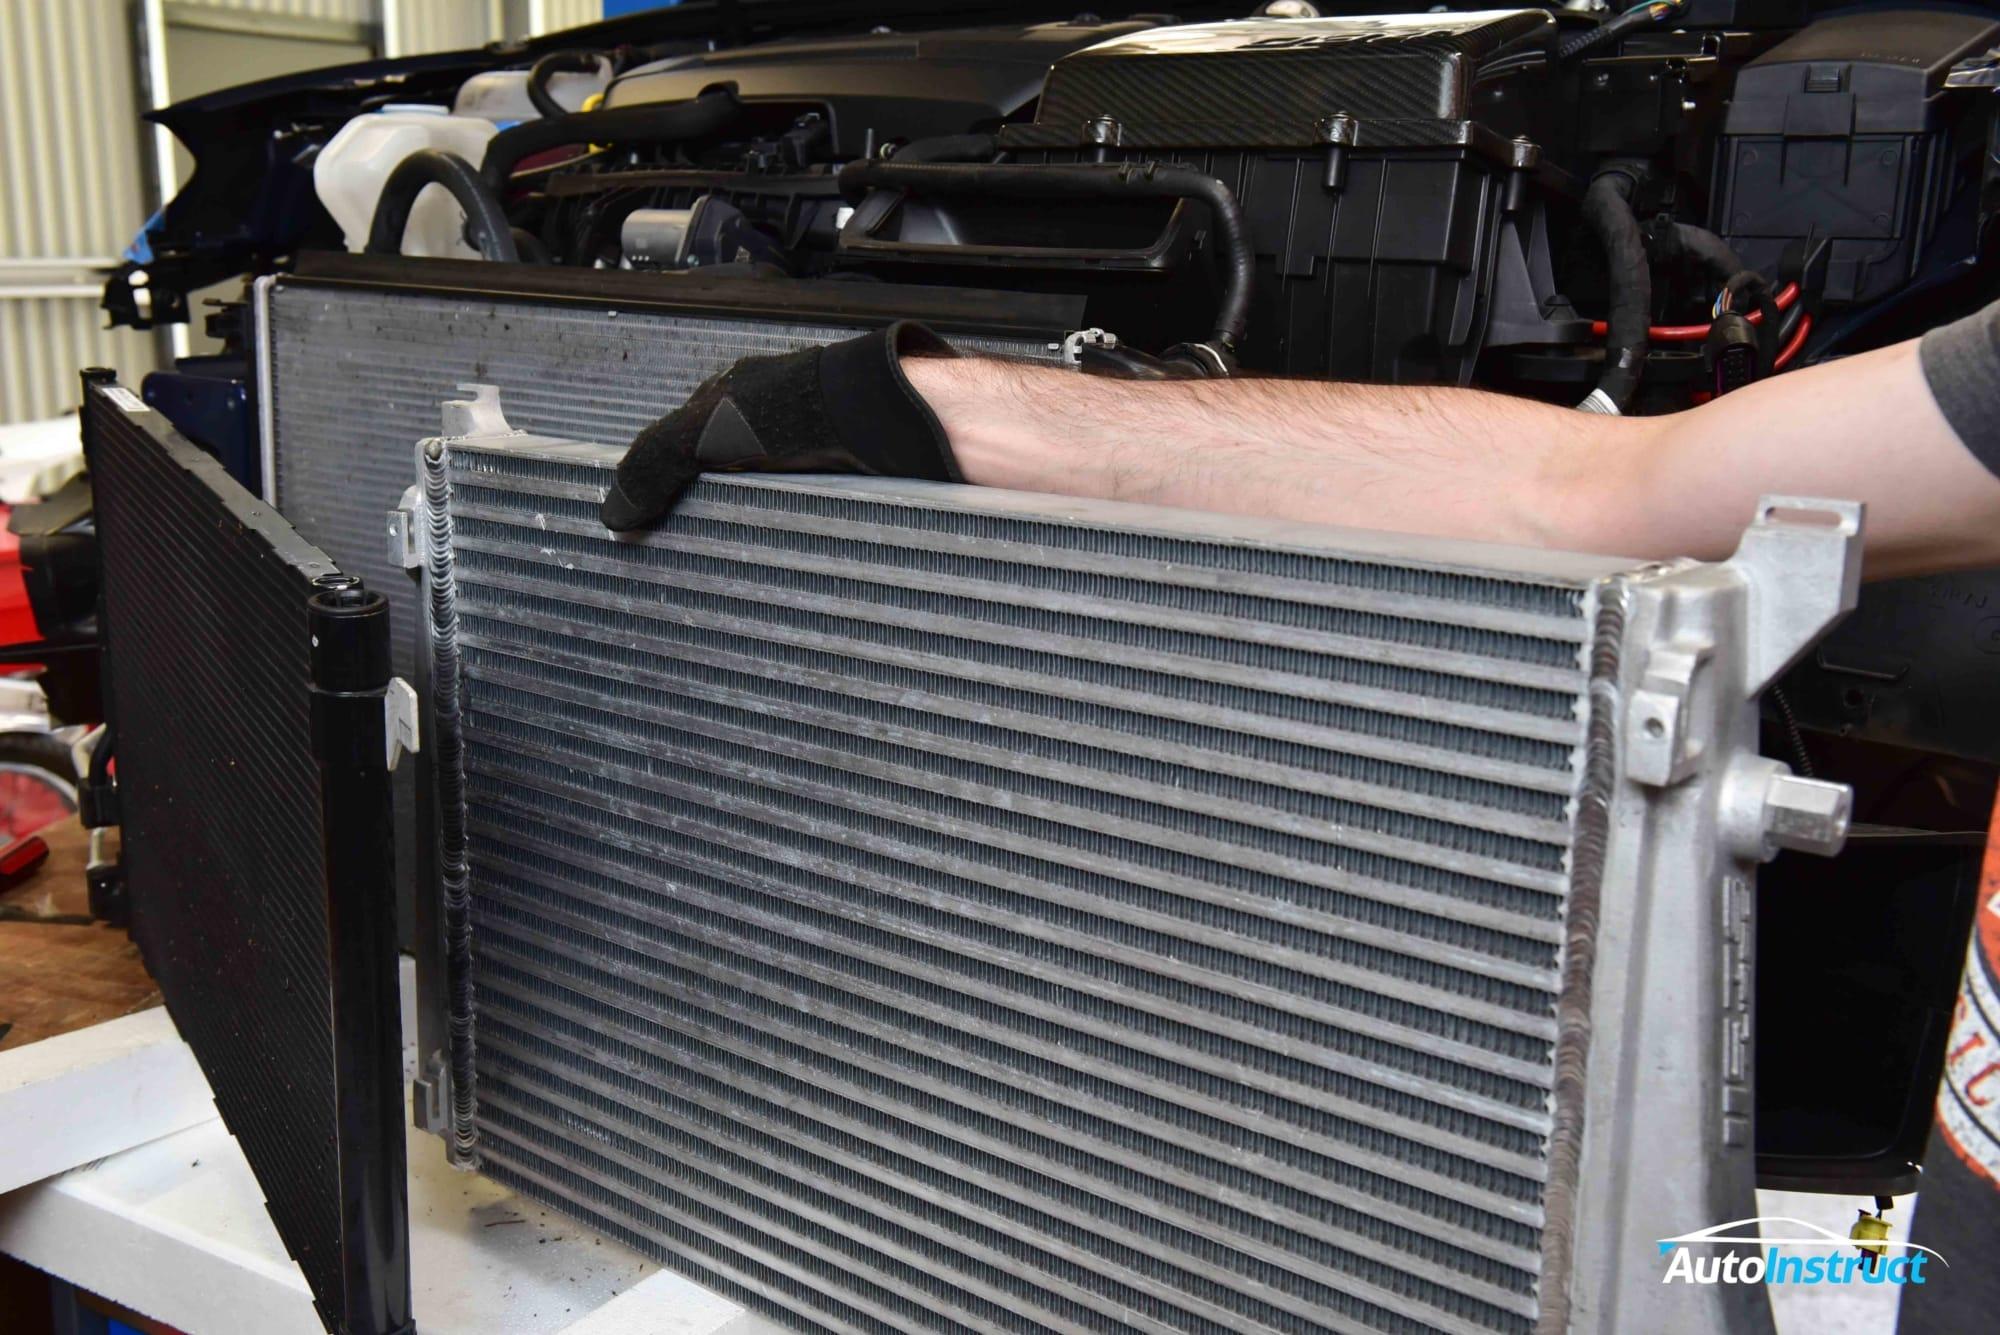 MK7 Golf Intercooler Install CTS